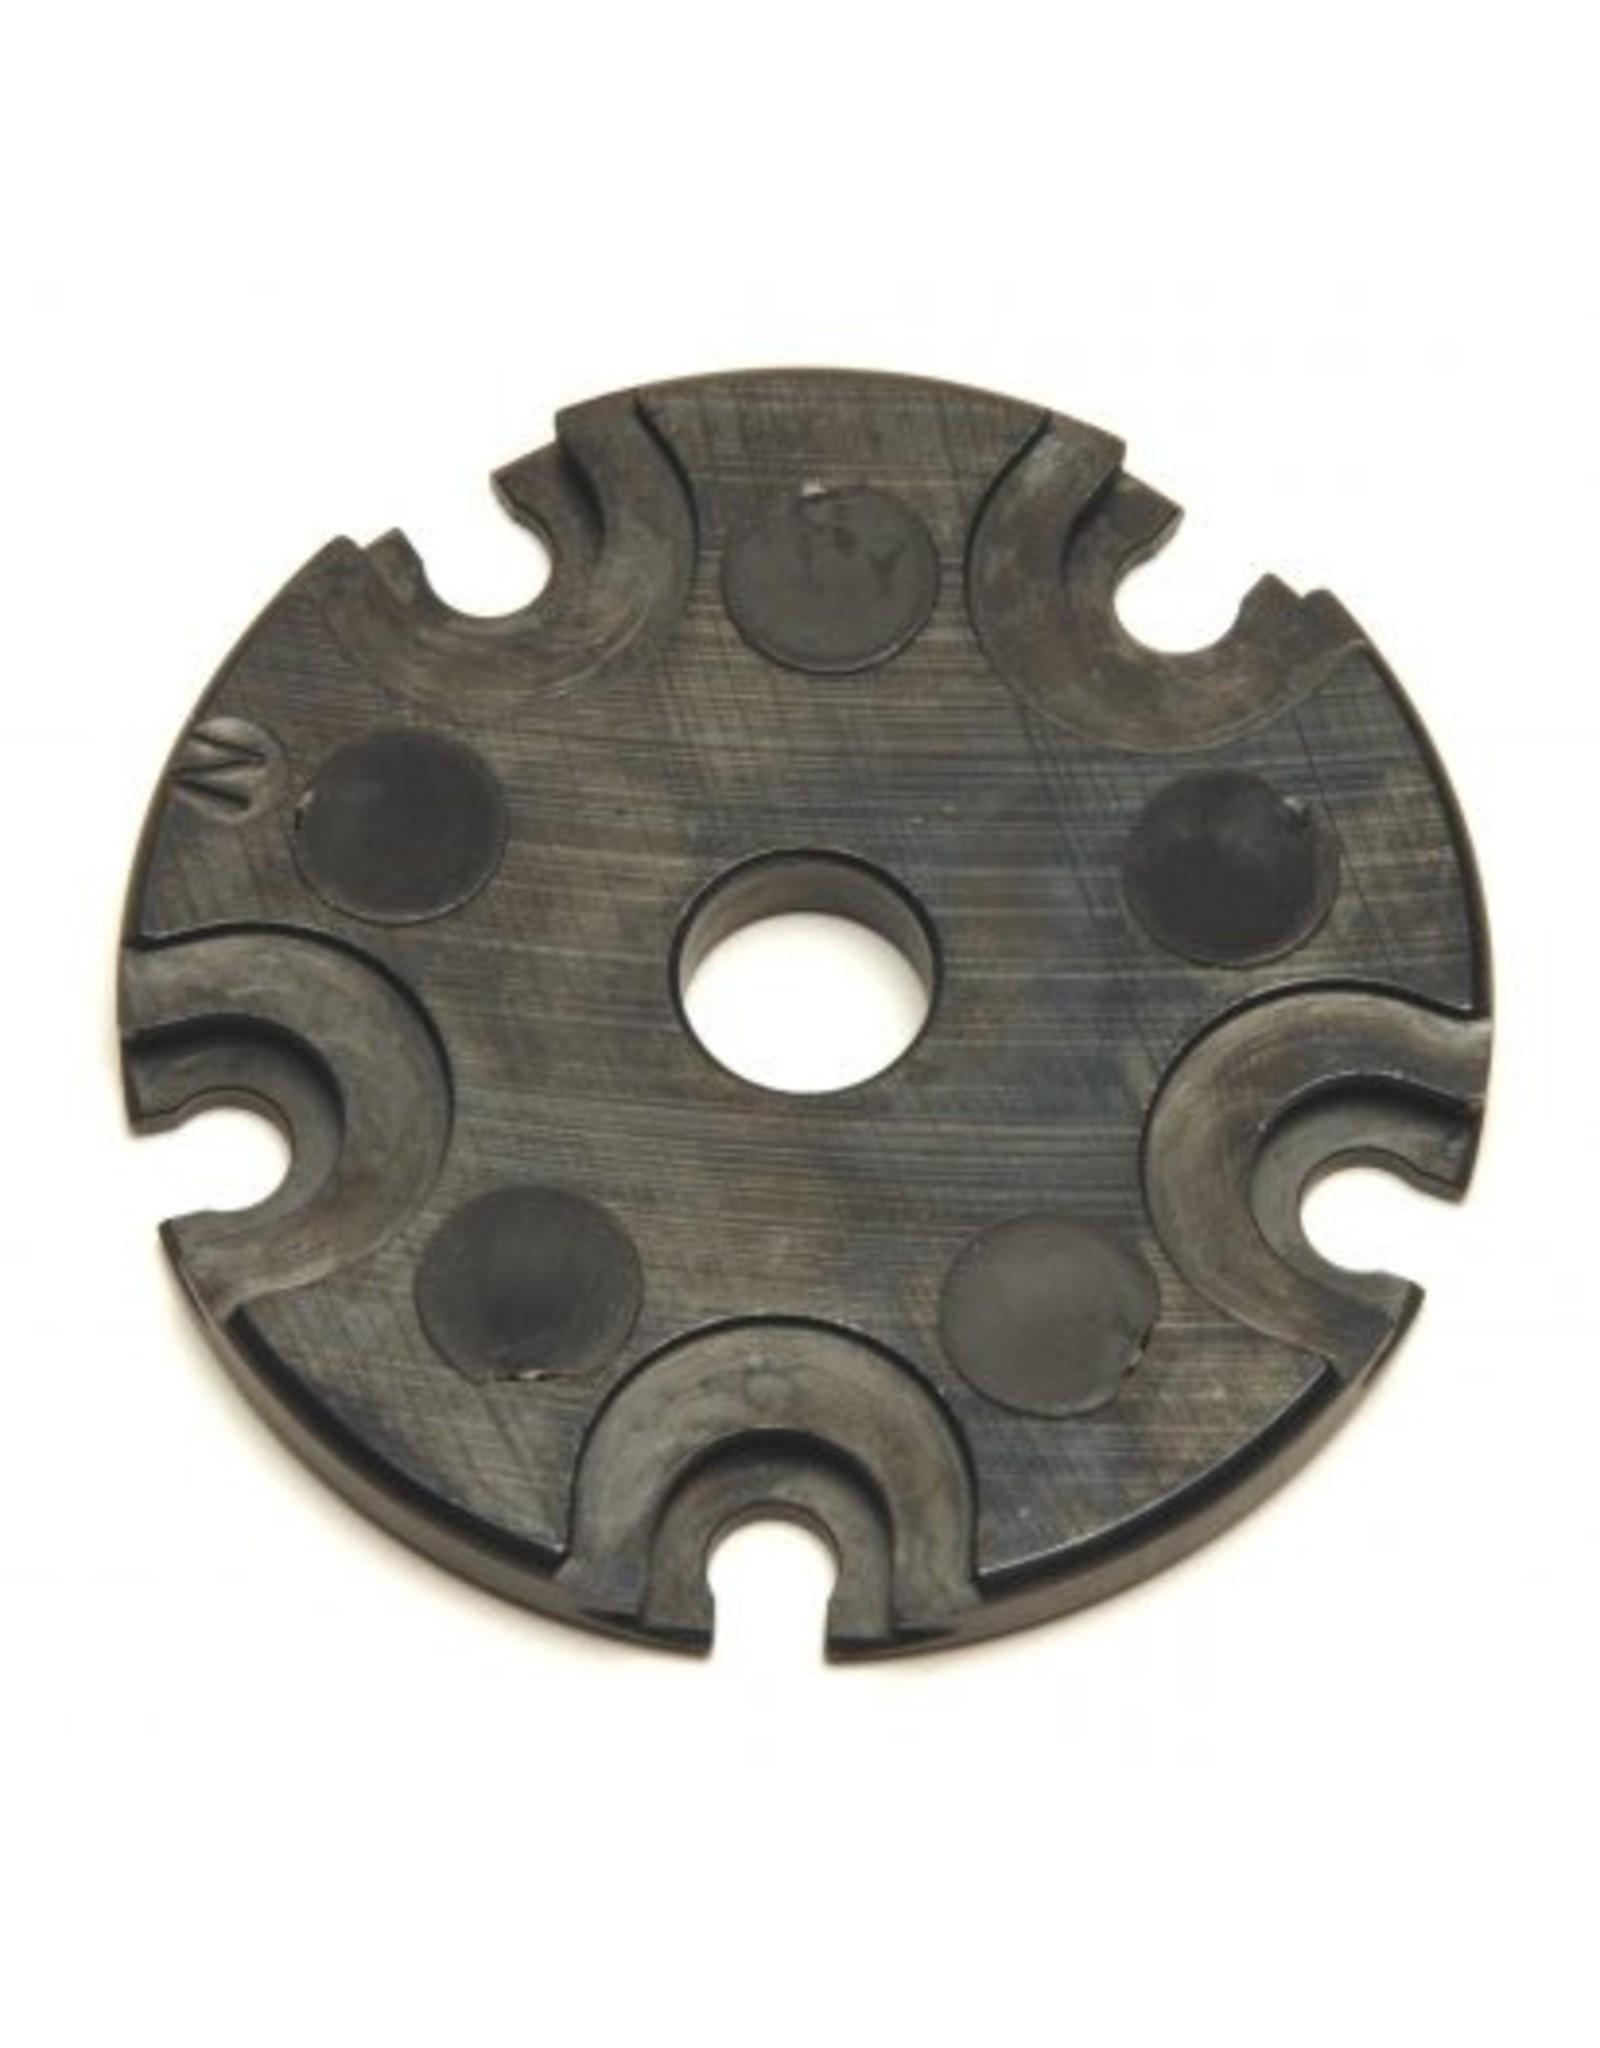 Dillon Precision Dillon 650/750 Shellplate -